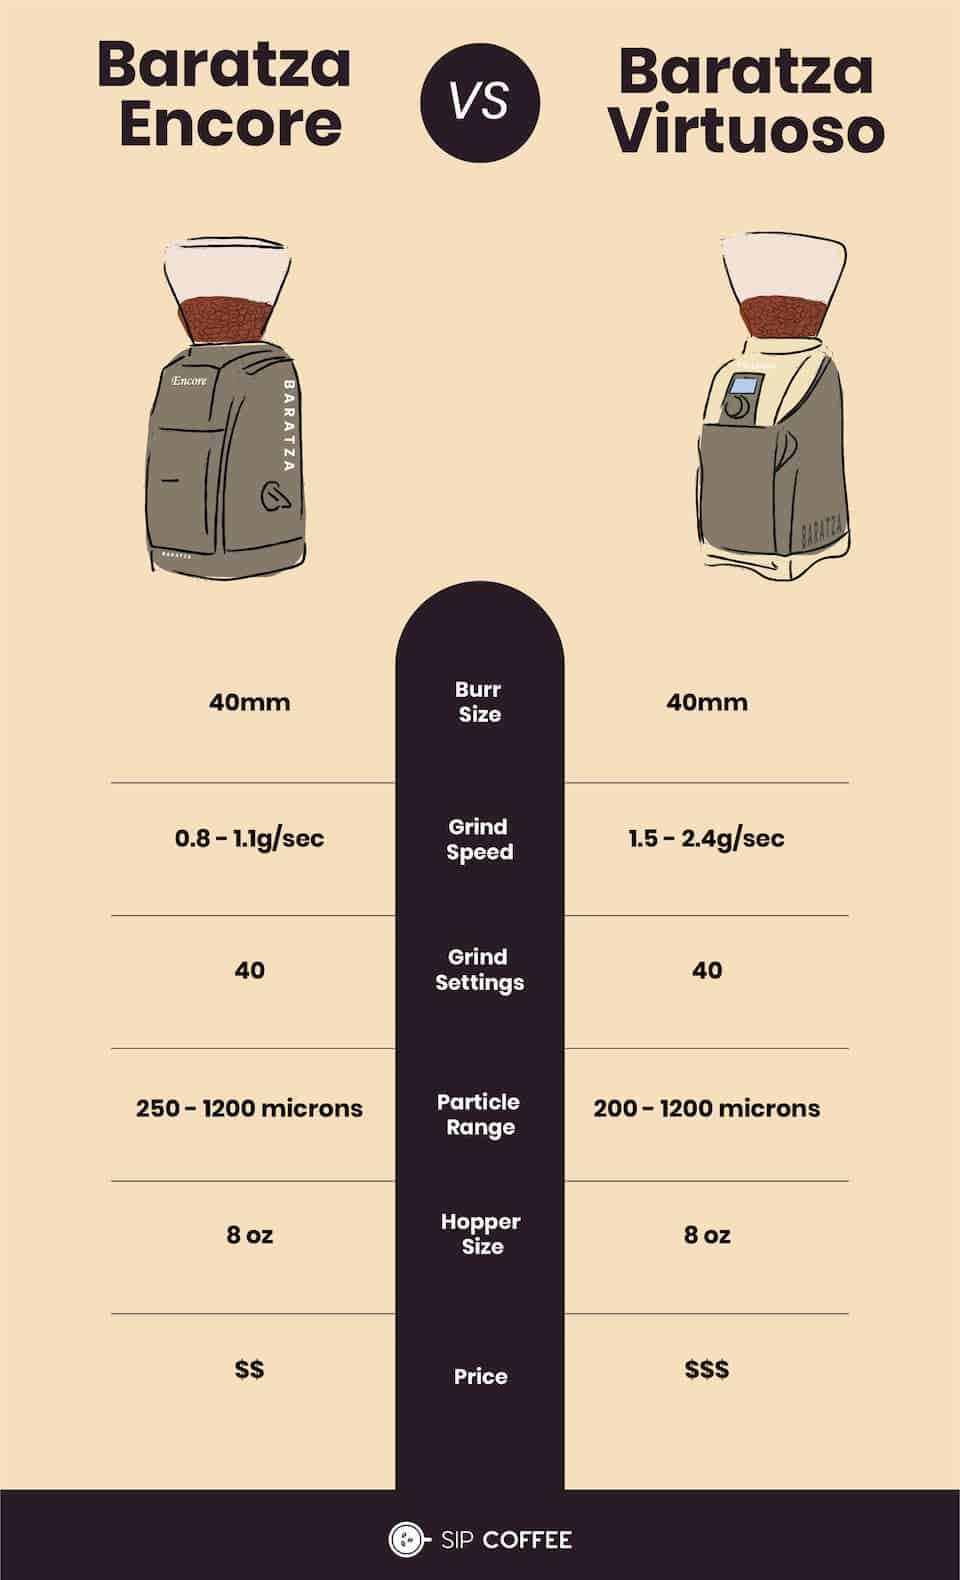 Baratza infographic